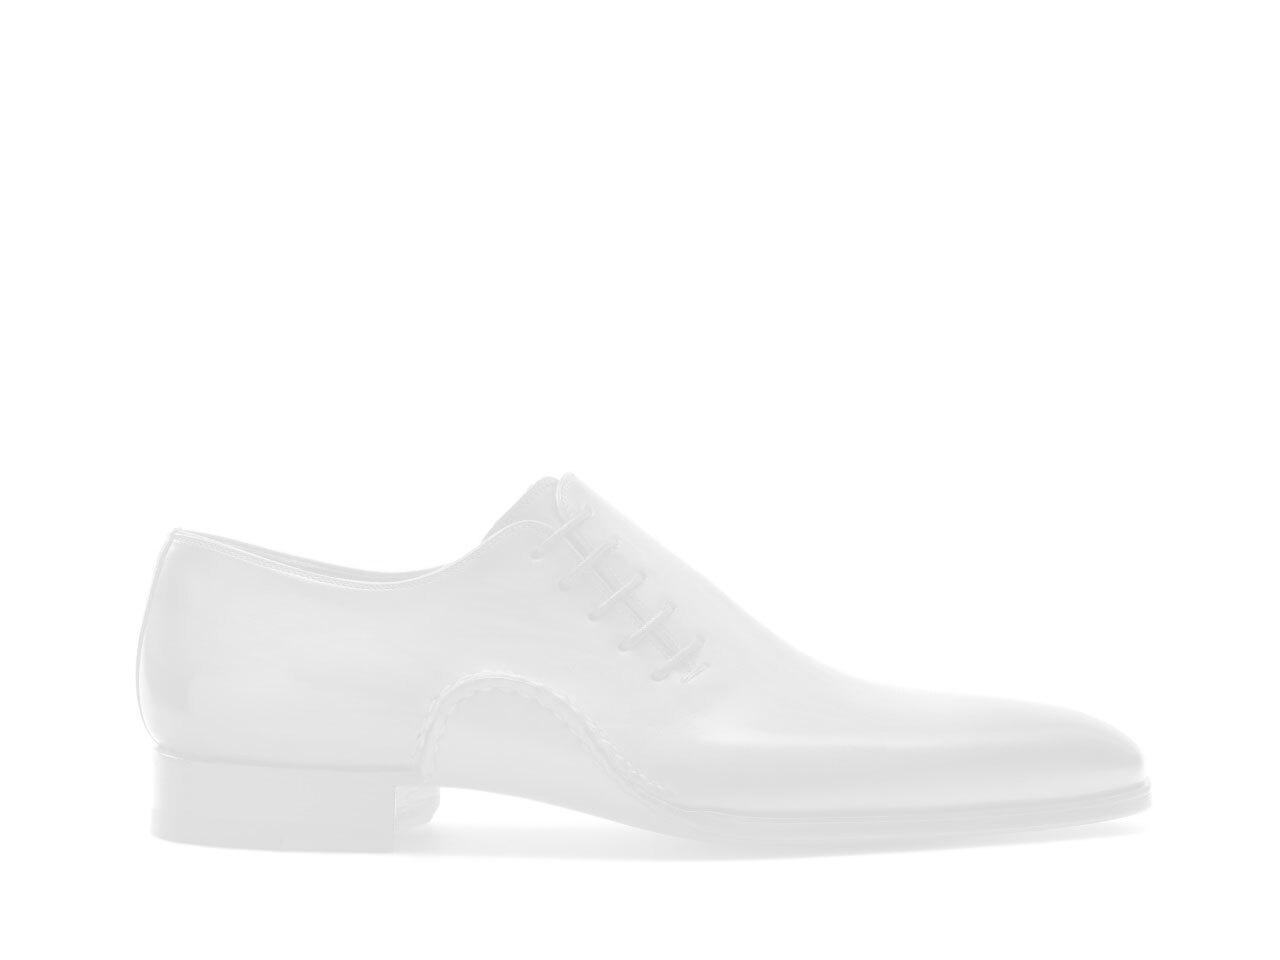 ac3b3af93af Peyton Cognac | Men's Casual Shoes | Magnanni